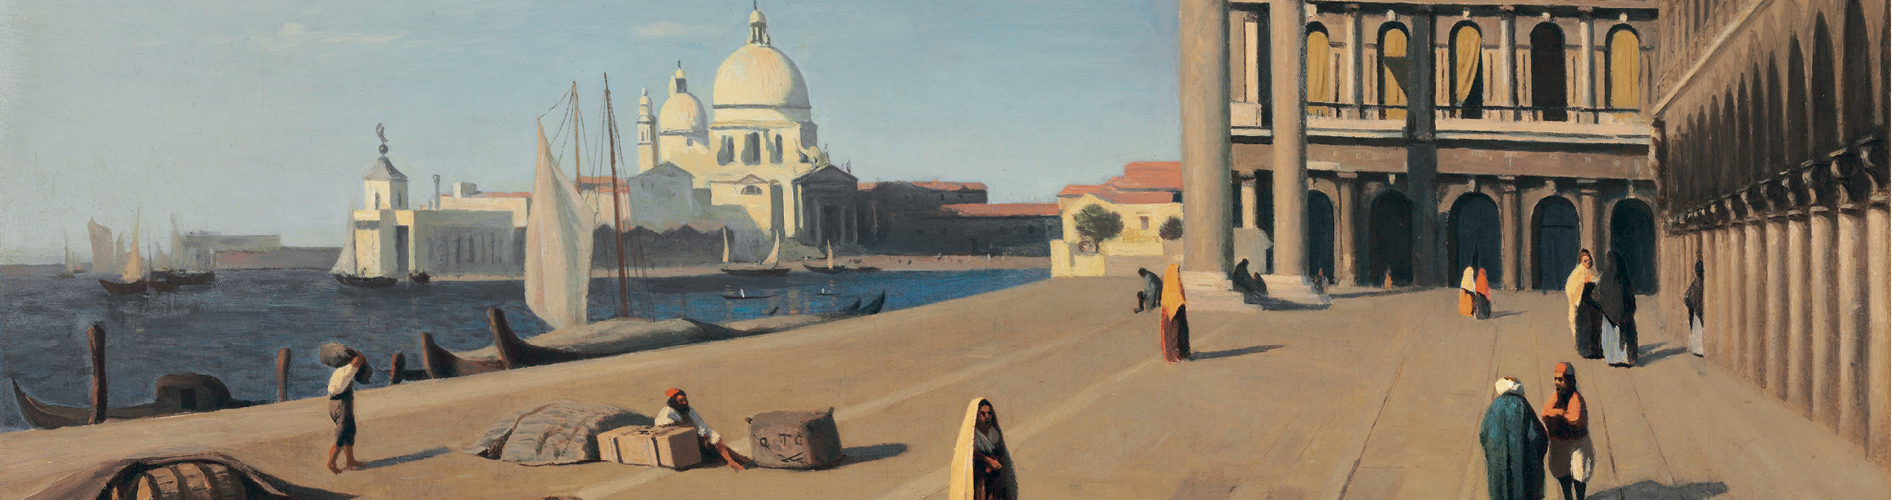 Jean-Baptiste-Camille-Corot-19th-century-european-paintings-Christies_66_1_20200416221409.jpg